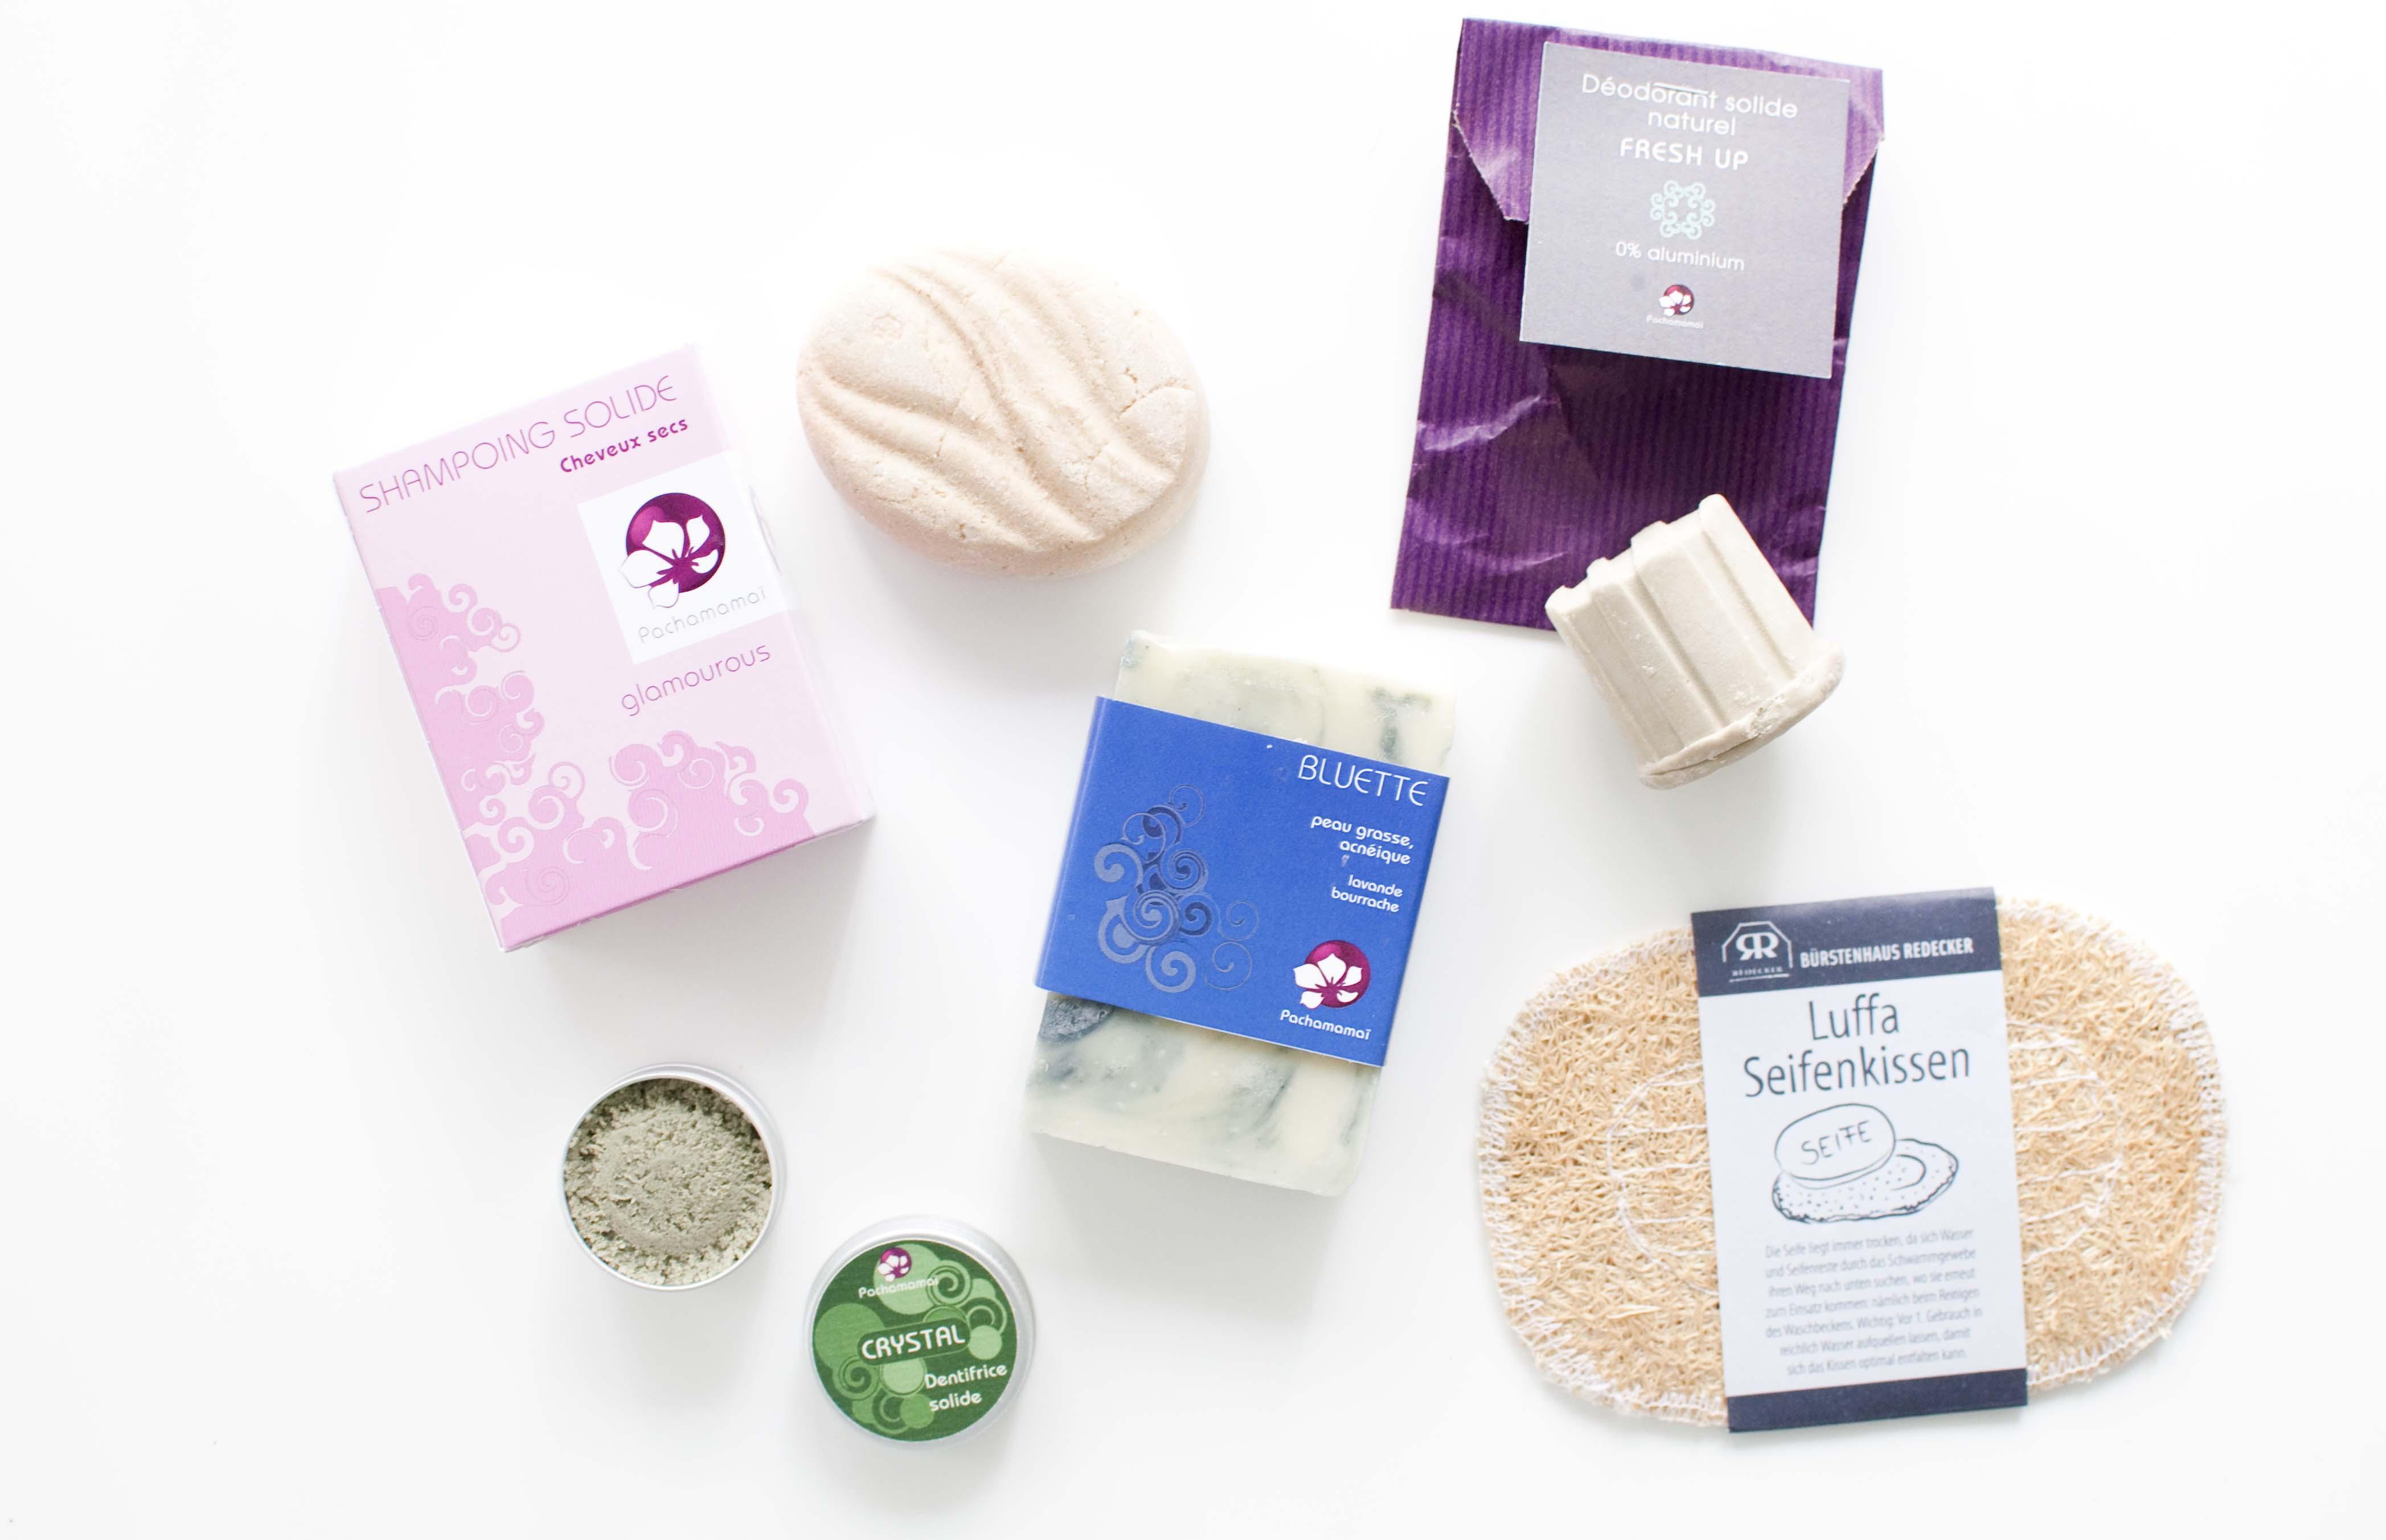 Frosta Krukje Ikea : Review pachamamaÏ vegan & zero waste zolea bloglovin